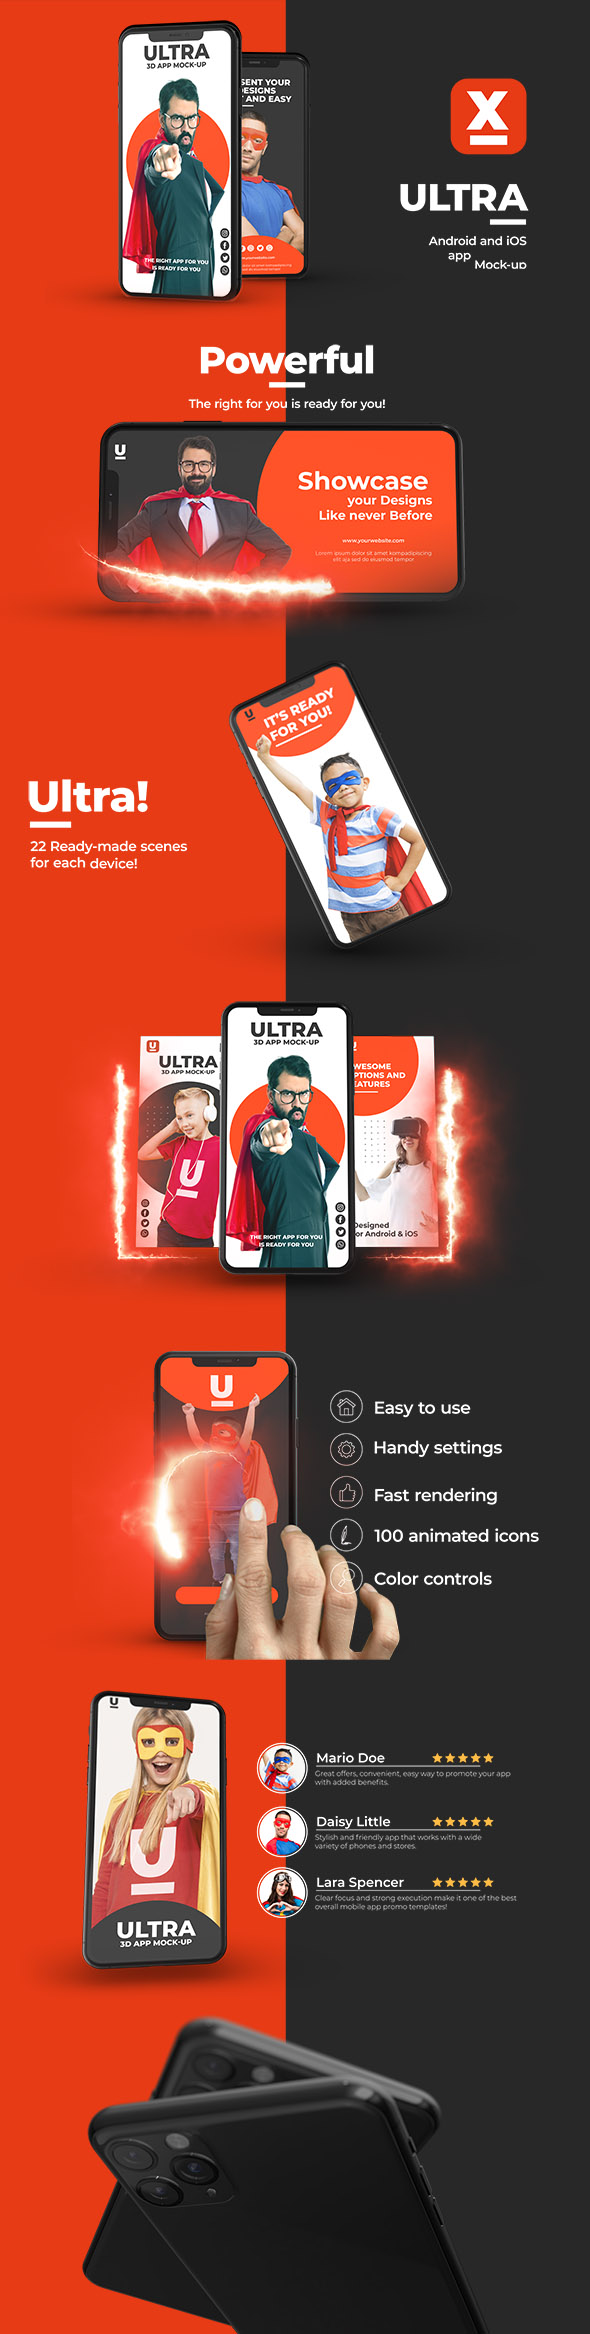 Ultra App Promo - 6